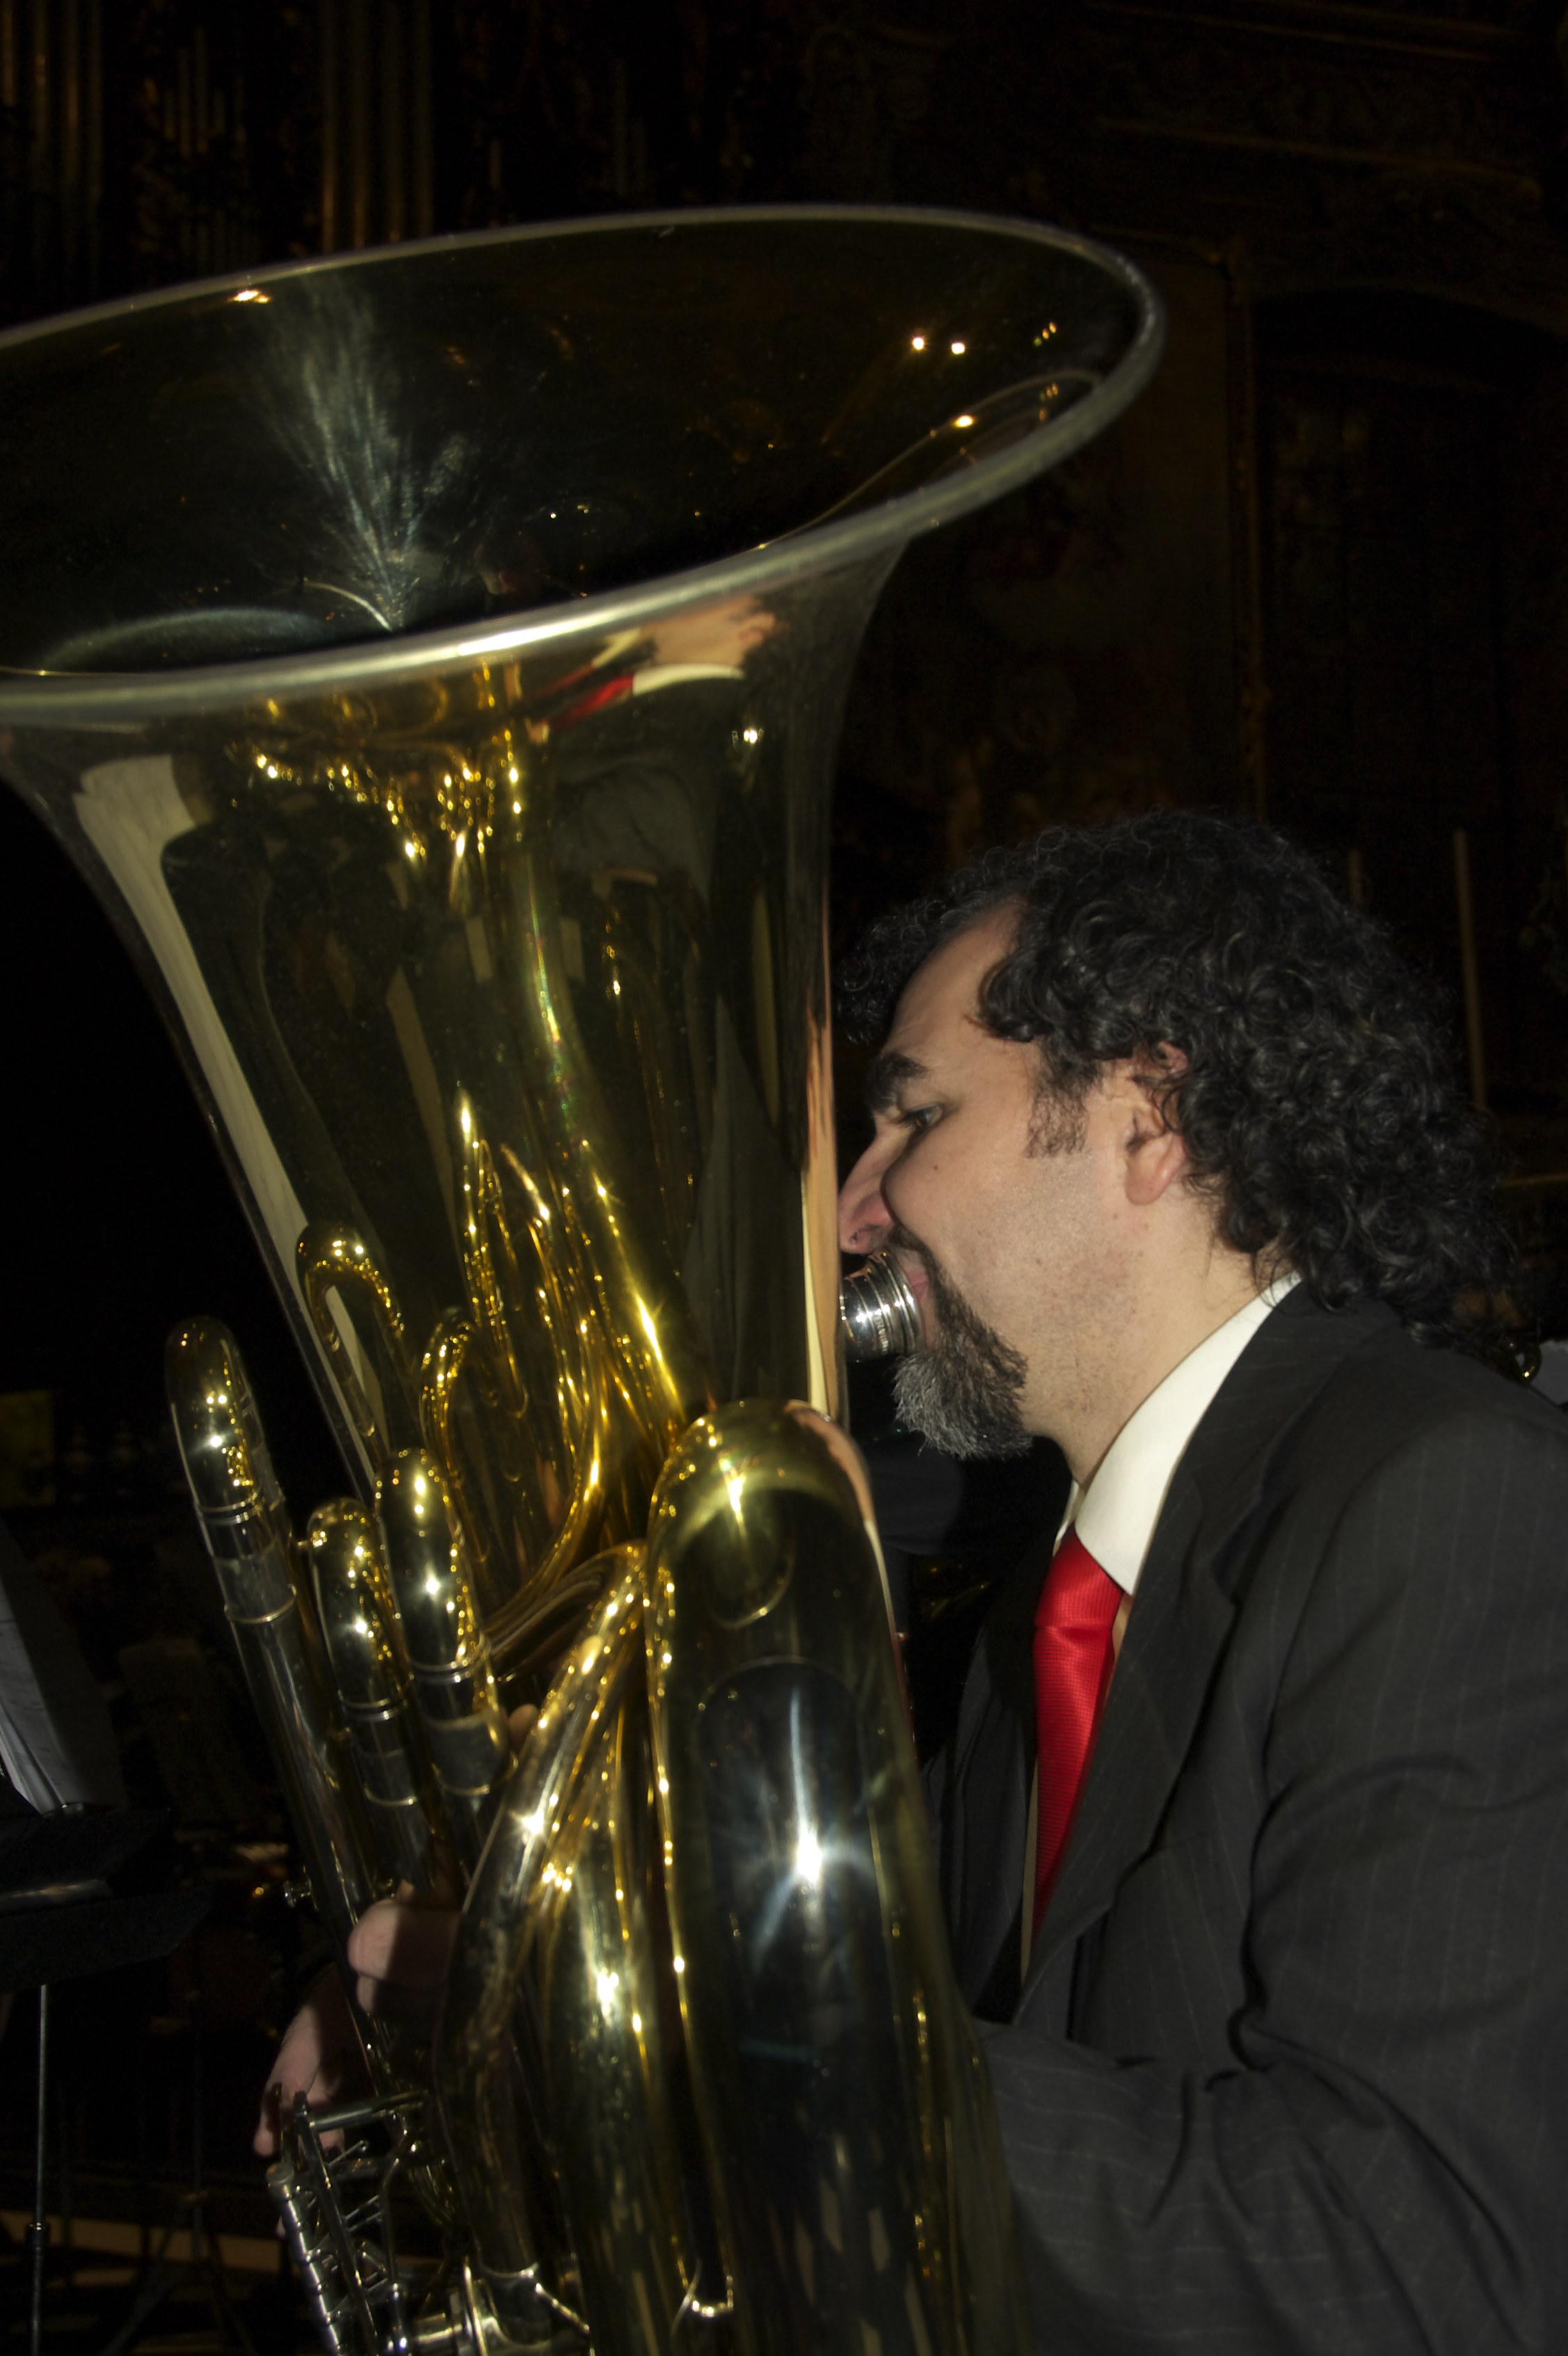 Monica - Orchestra Marco Antony Ahi Ahi Ragazzo / Pa' Diglielo A Ma'